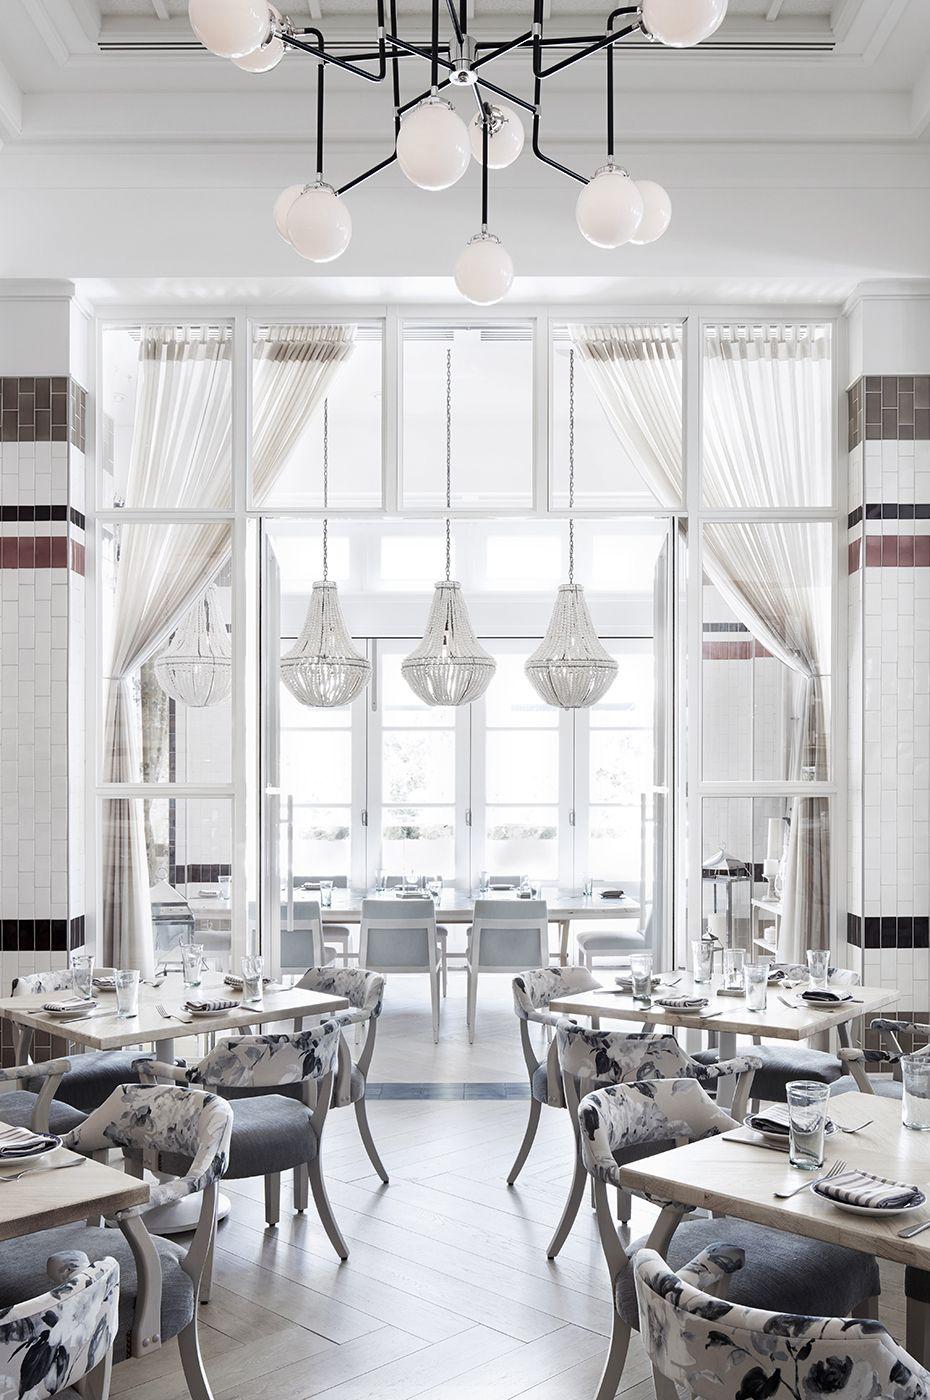 Bottiglia cucina enoteca henderson nv usa interior for Interior design usa